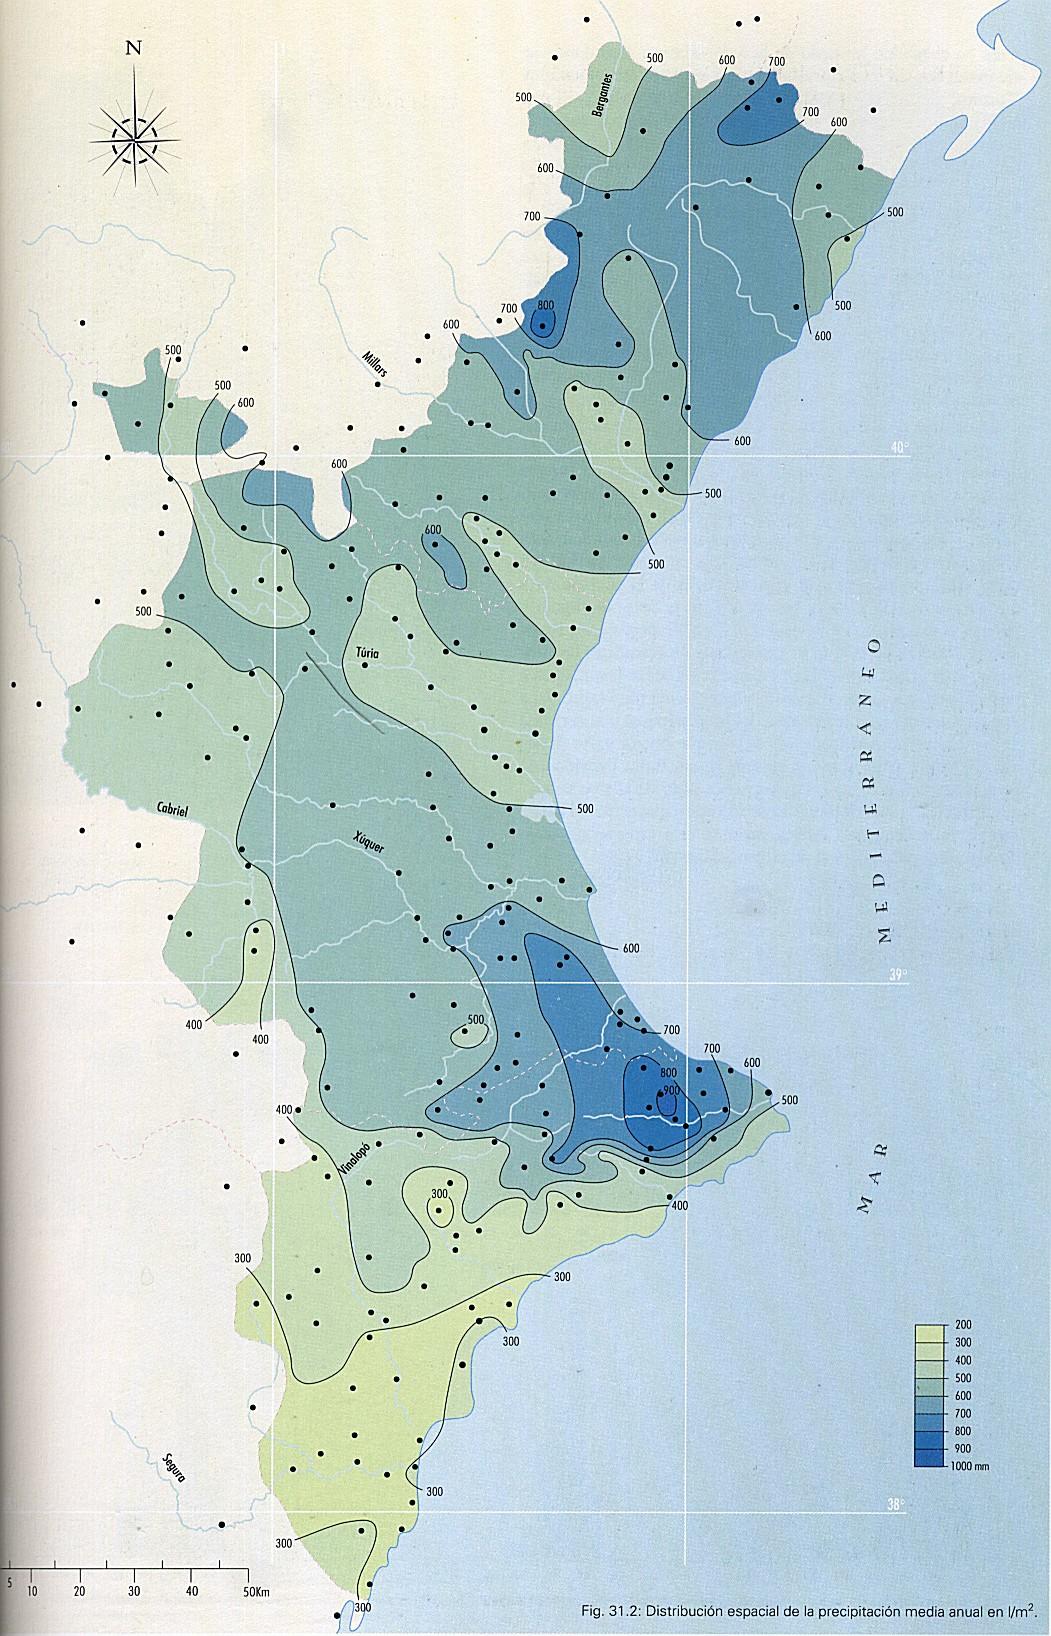 Average annual rainfall in the Valencian Community